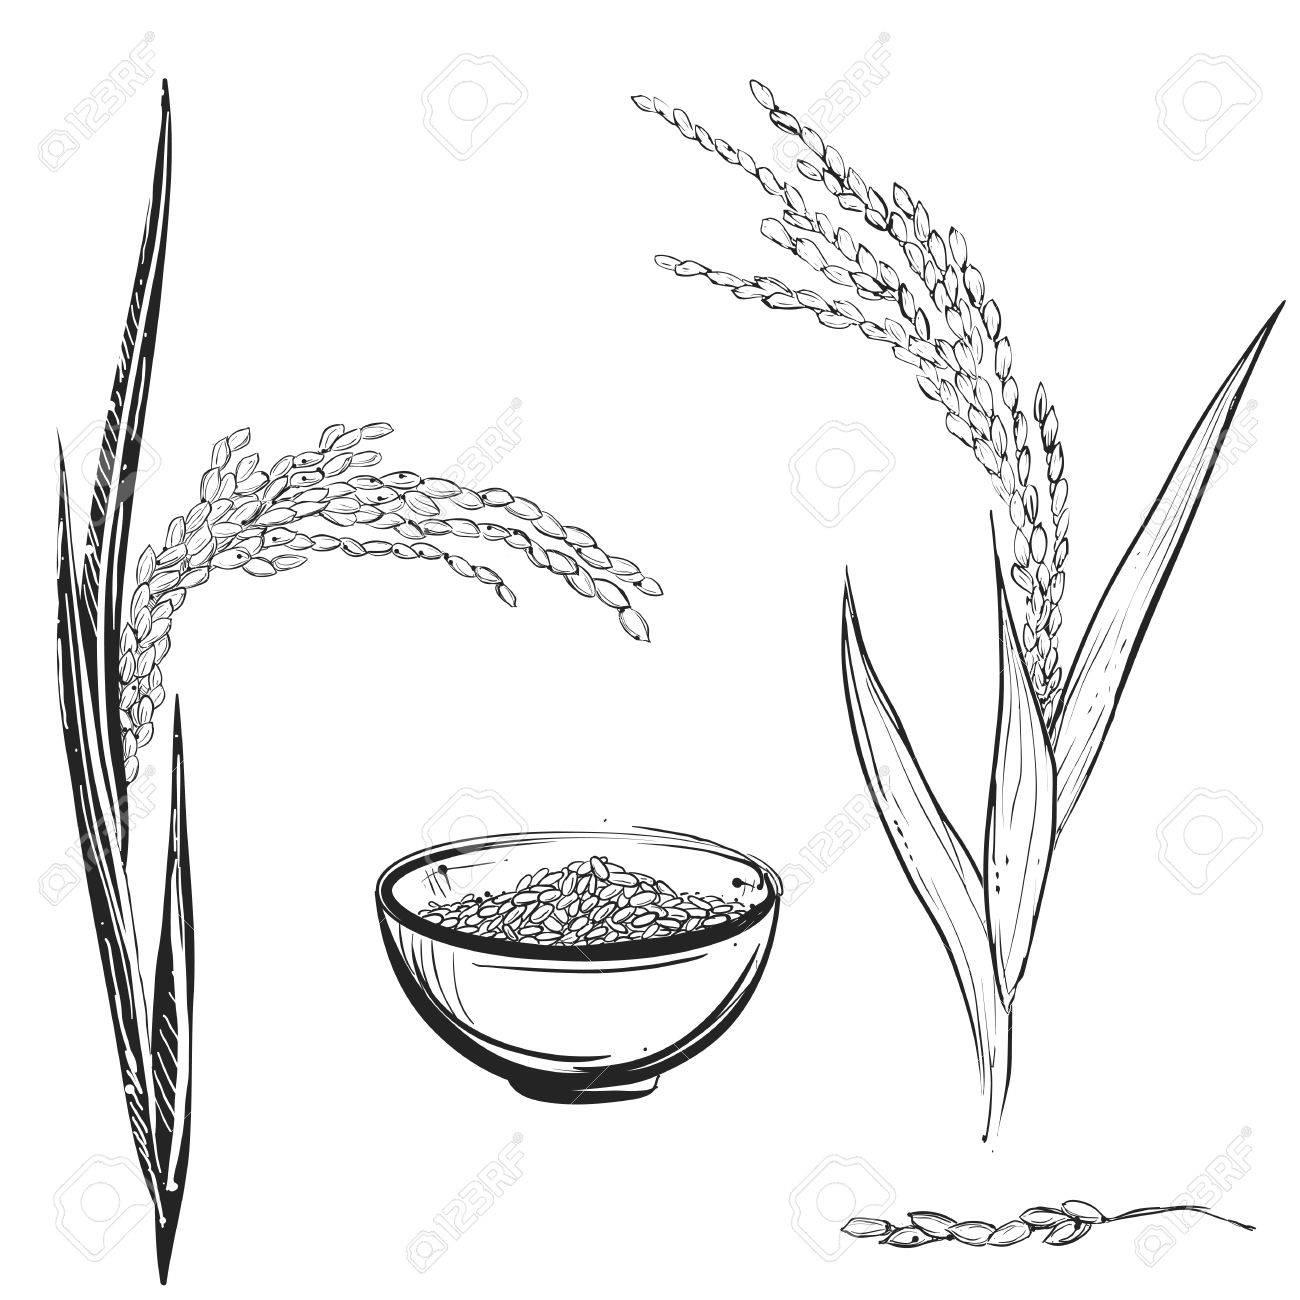 hight resolution of 1300x1300 hand drawn monochrome vector illustration of rice plant grain